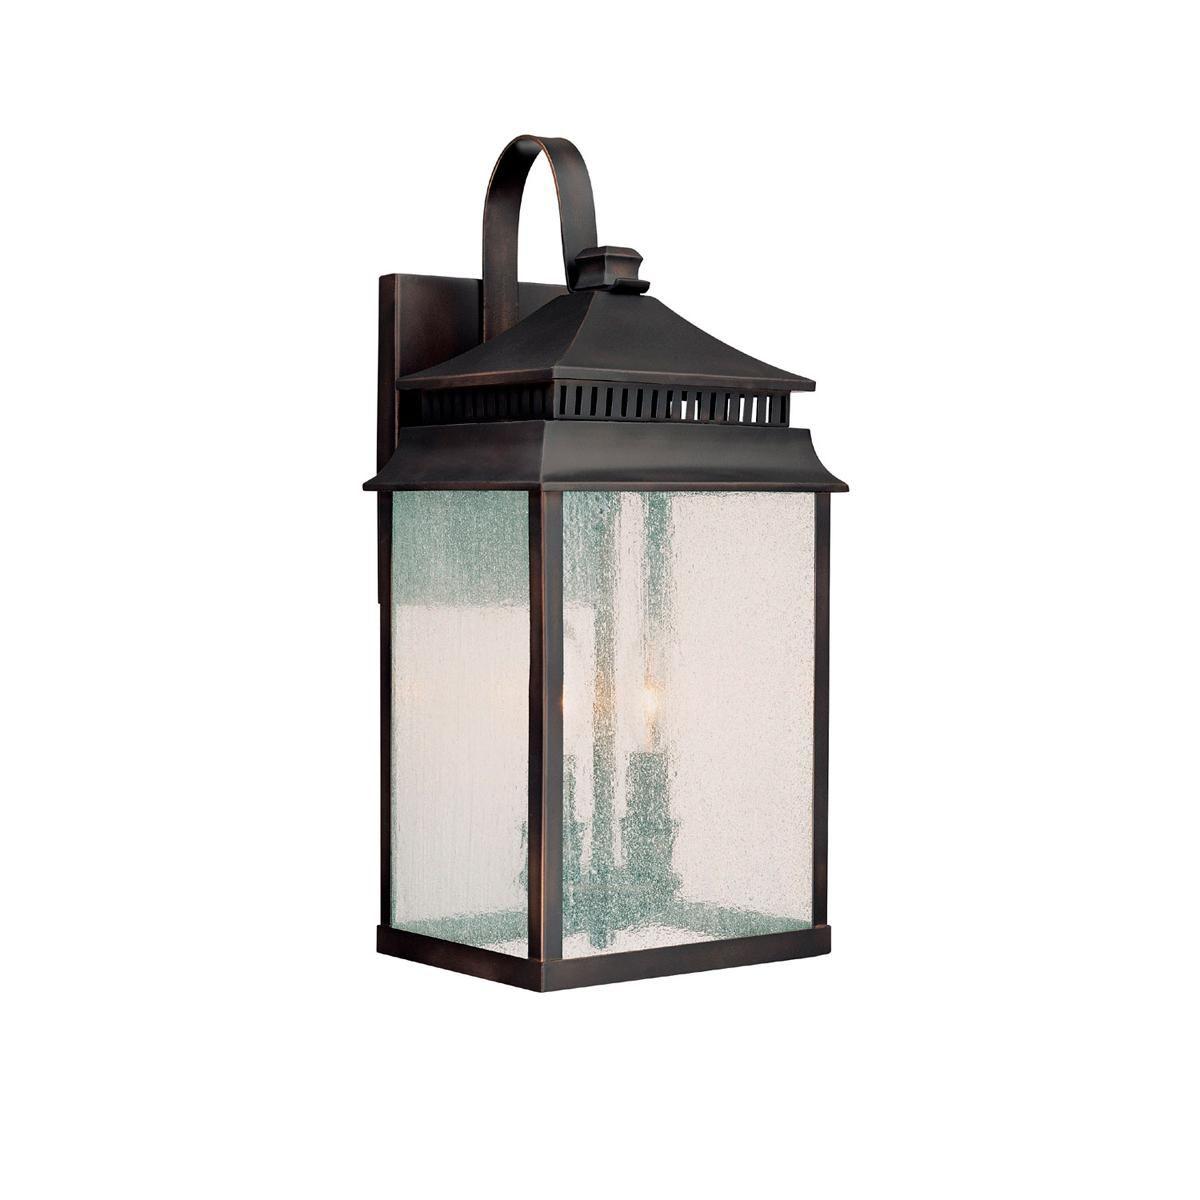 Modern grill rectangular outdoor light modern lights and bulbs modern grill rectangular outdoor light arubaitofo Gallery